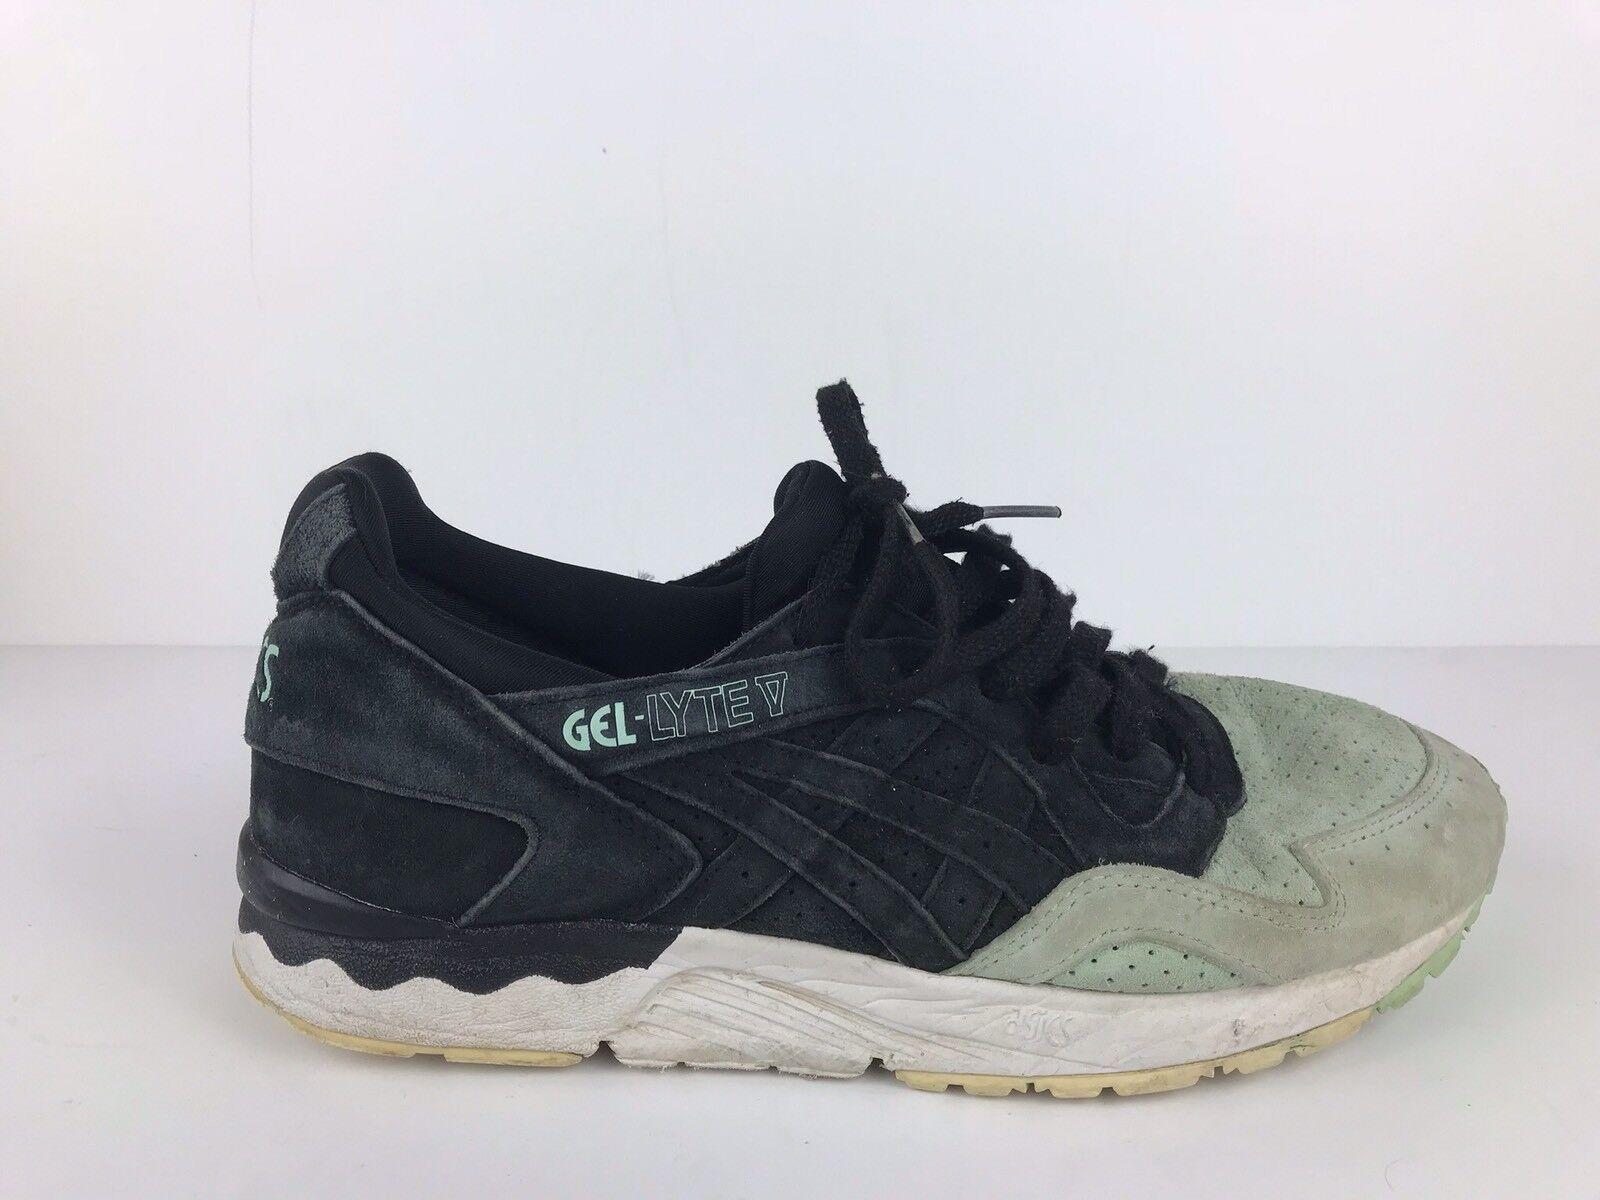 Asics Gel Lyte V Black Mint Casual Trainers shoes H737L Men's US 8